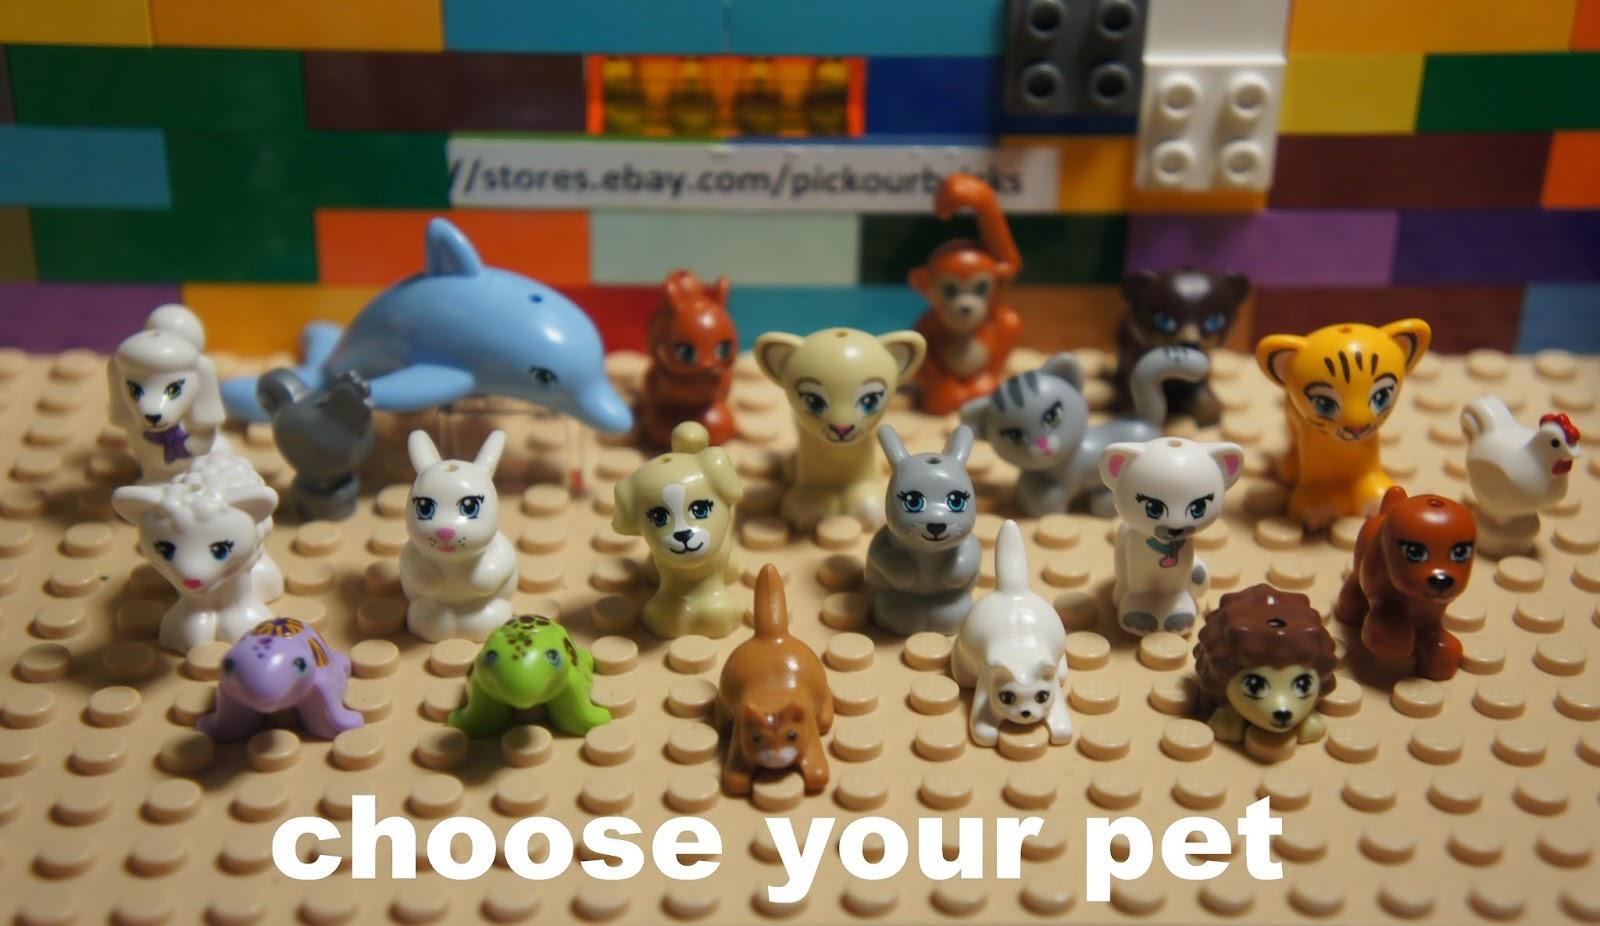 LEGO Friends PET ANIMALS Figure   Choose Dog Dolphin Cat Sheep Turtle  Rabbit Etc ~ Stores.ebay.com/pickourbricks